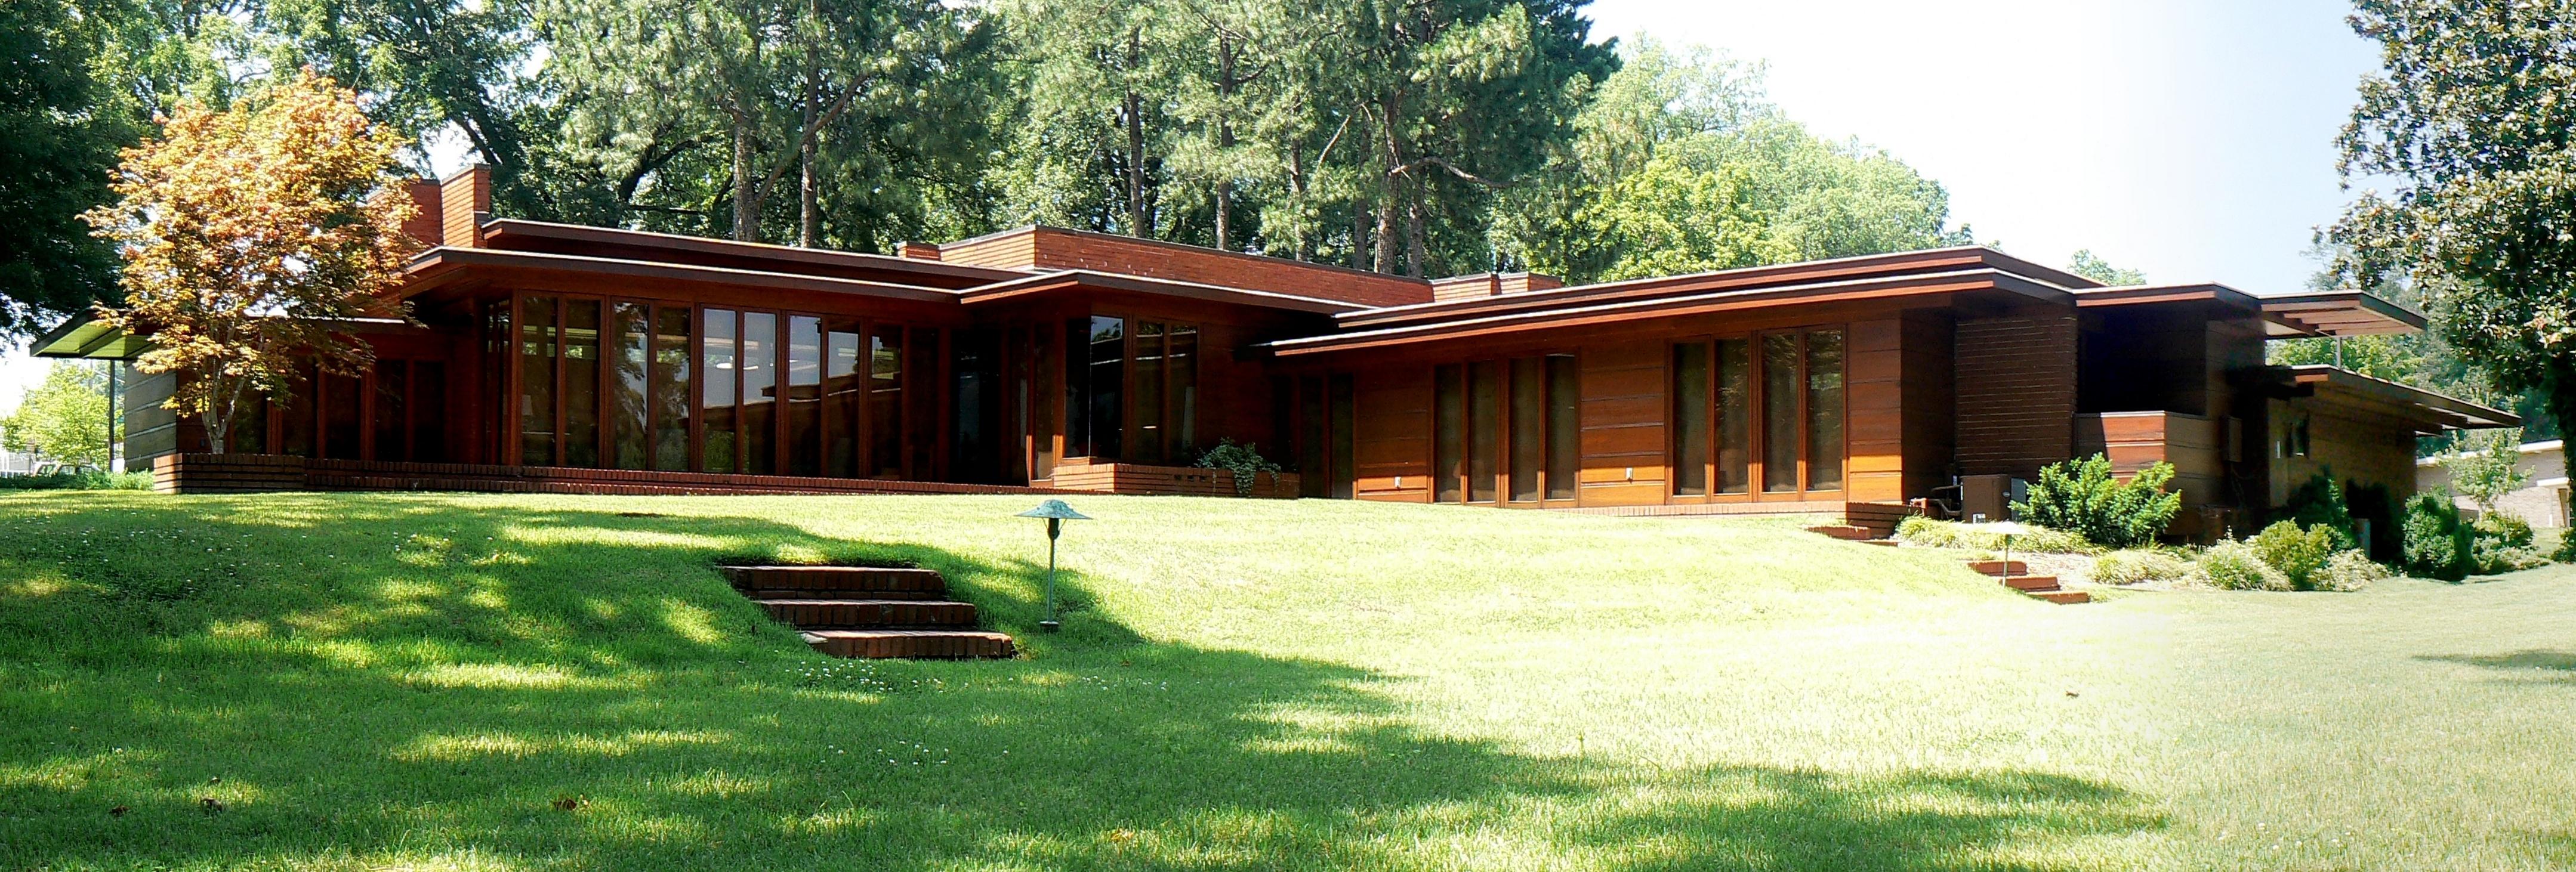 Frank Lloyd Wright Falling Water Interior Design